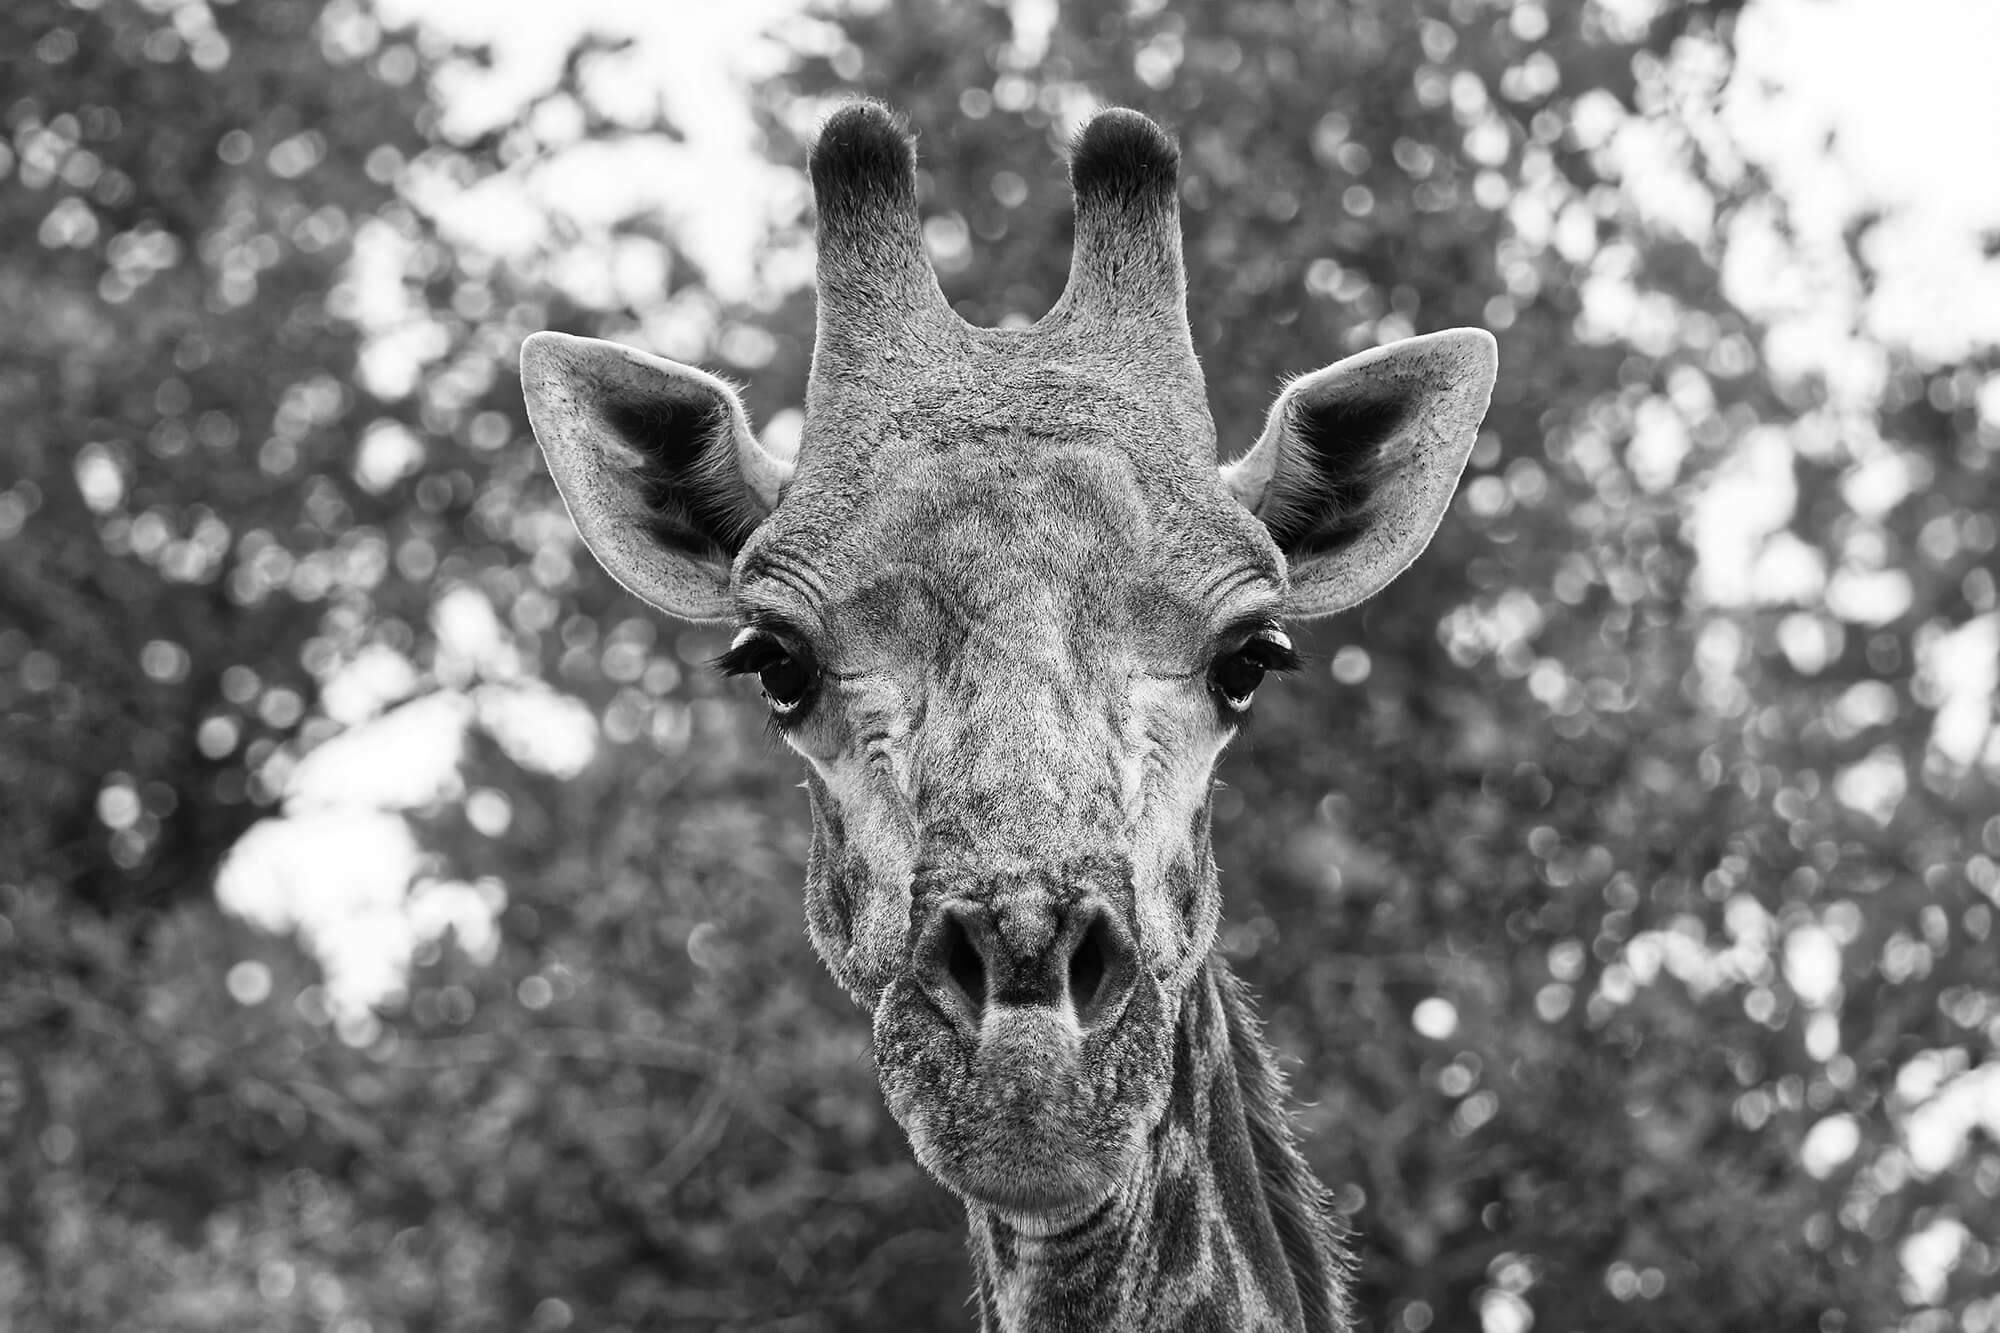 viajes-a-africa-safaris-fotografico-en-botswana